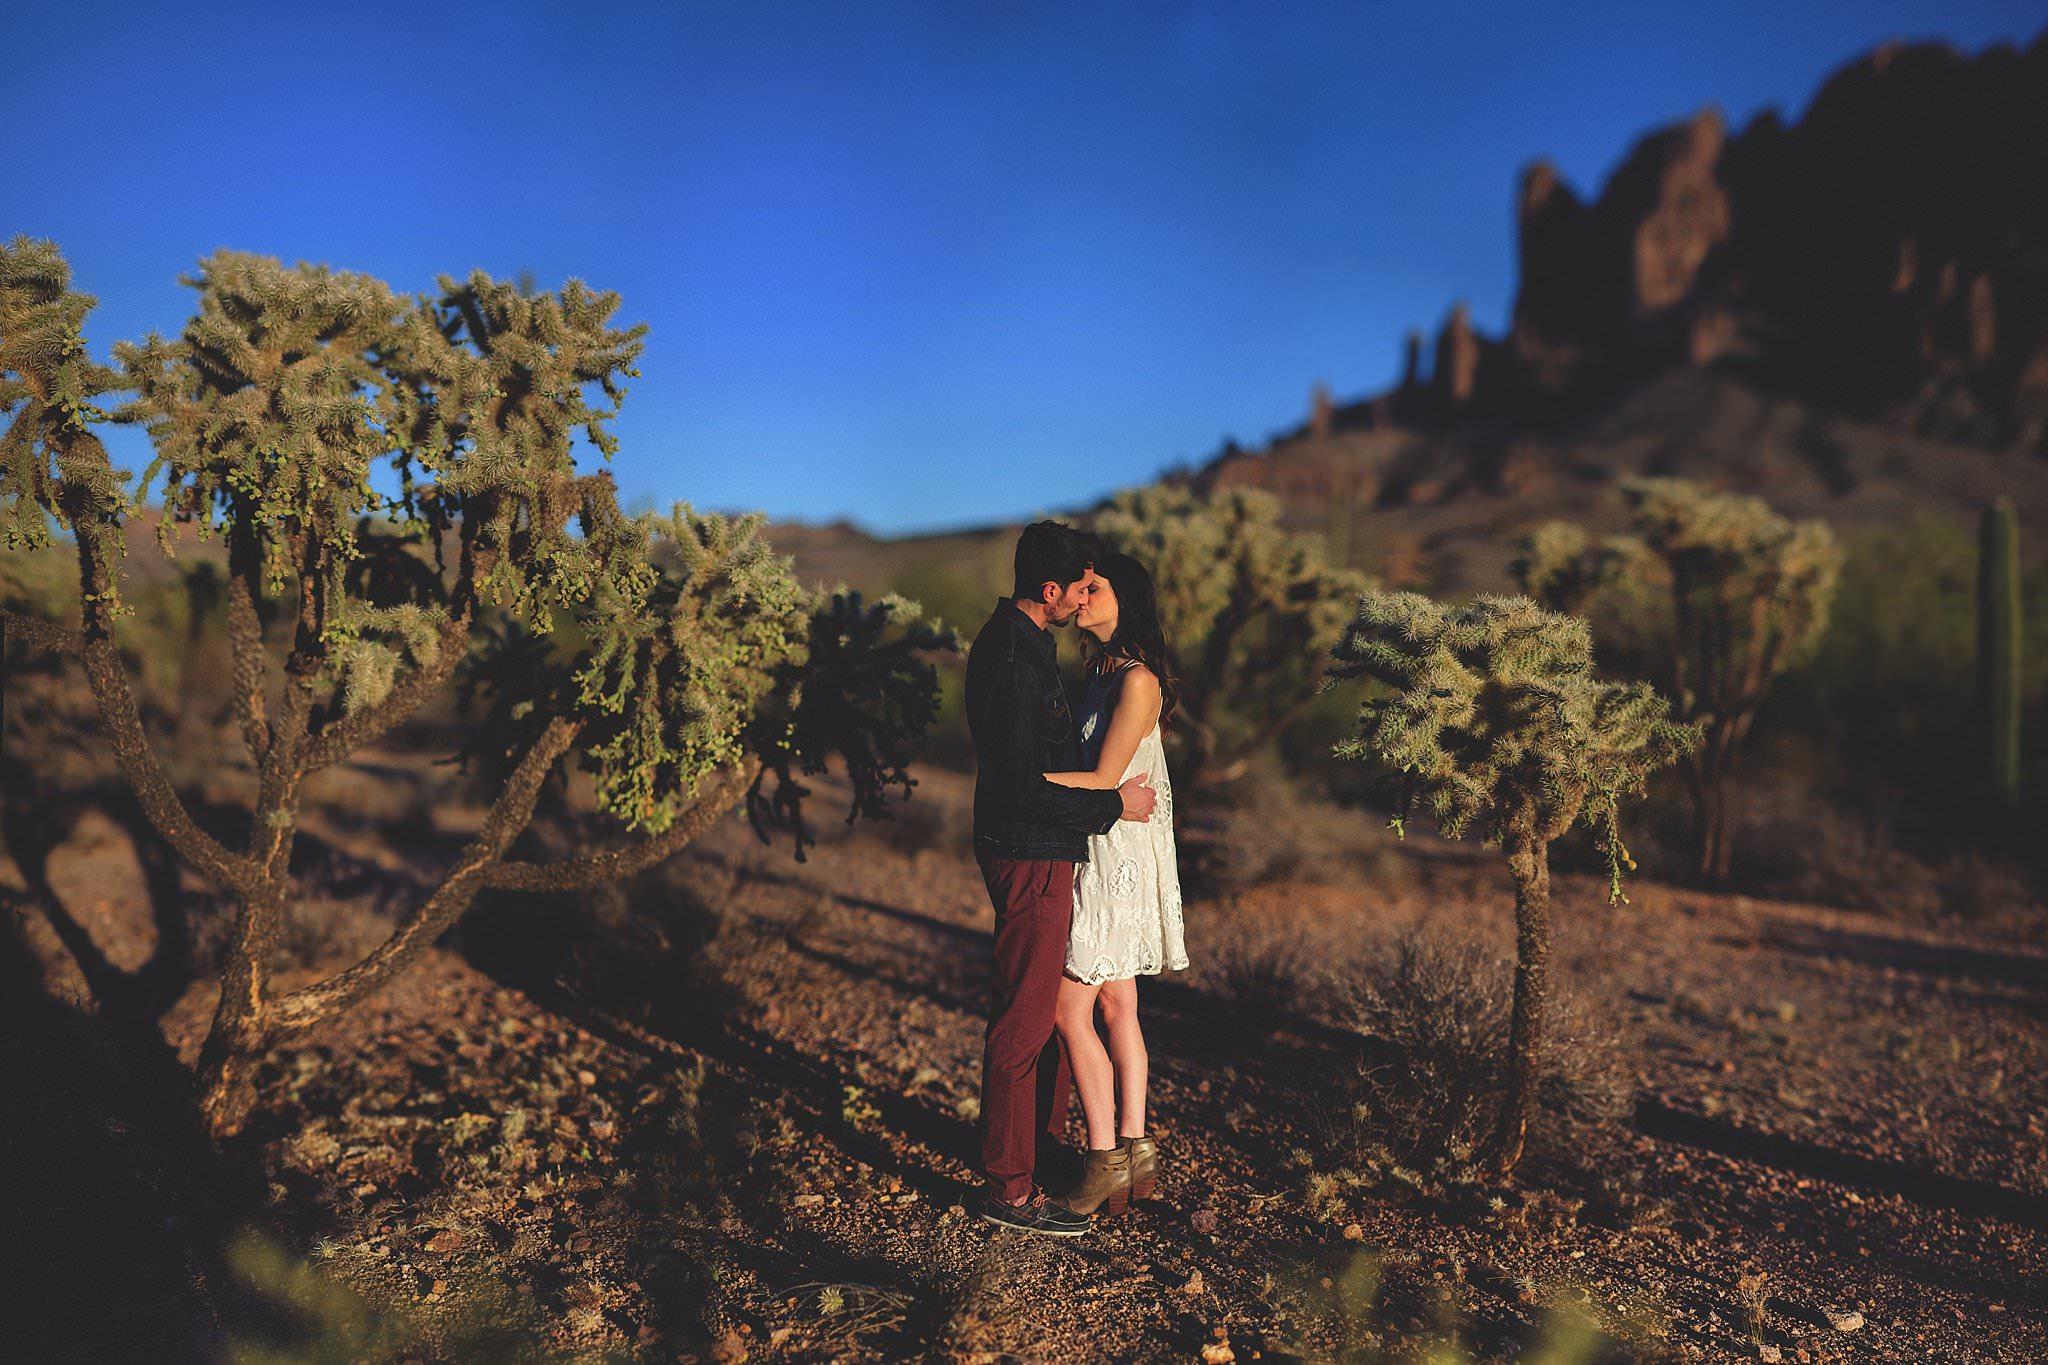 superstition-mountains-desert-engagement-photos-0012.jpg